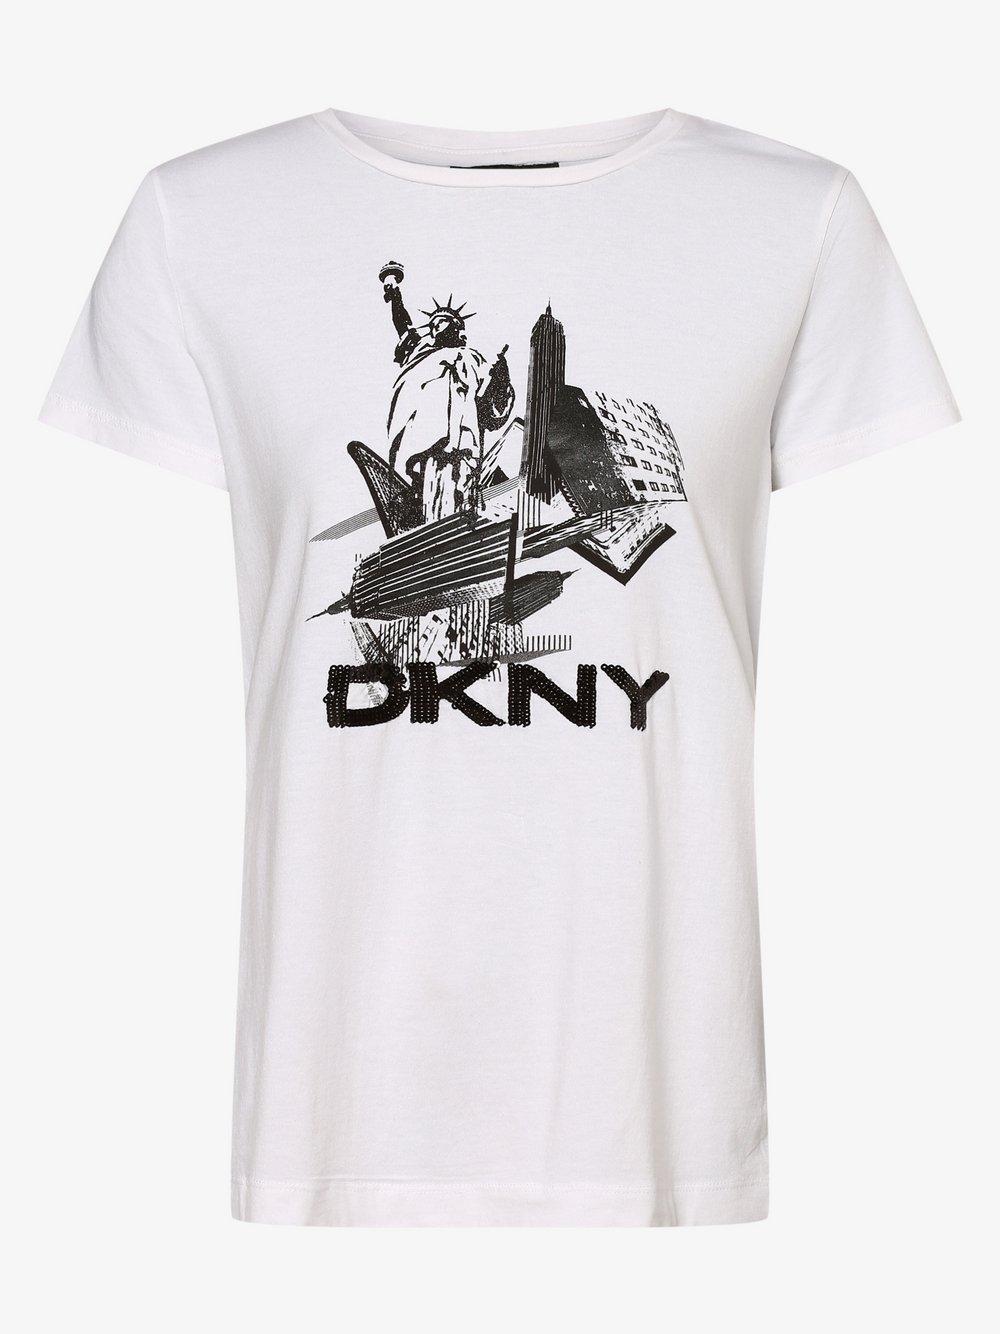 DKNY - T-shirt damski, biały